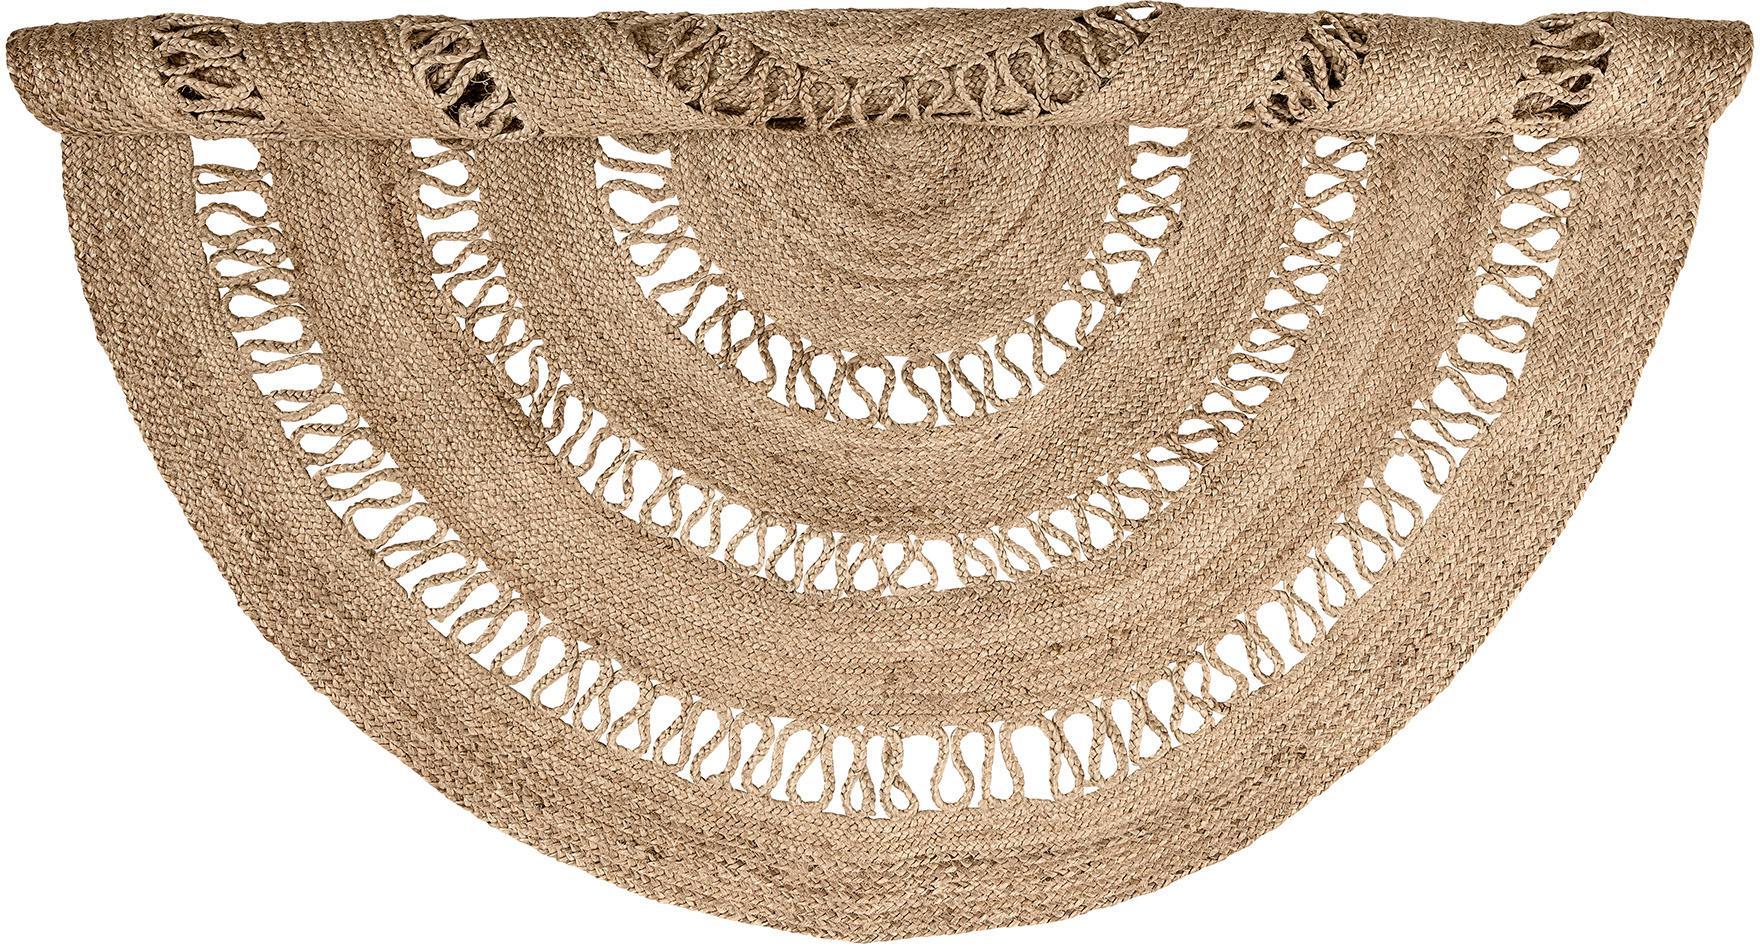 Okrągły dywan z juty Benita, Juta, Ø 182 cm (Rozmiar L)